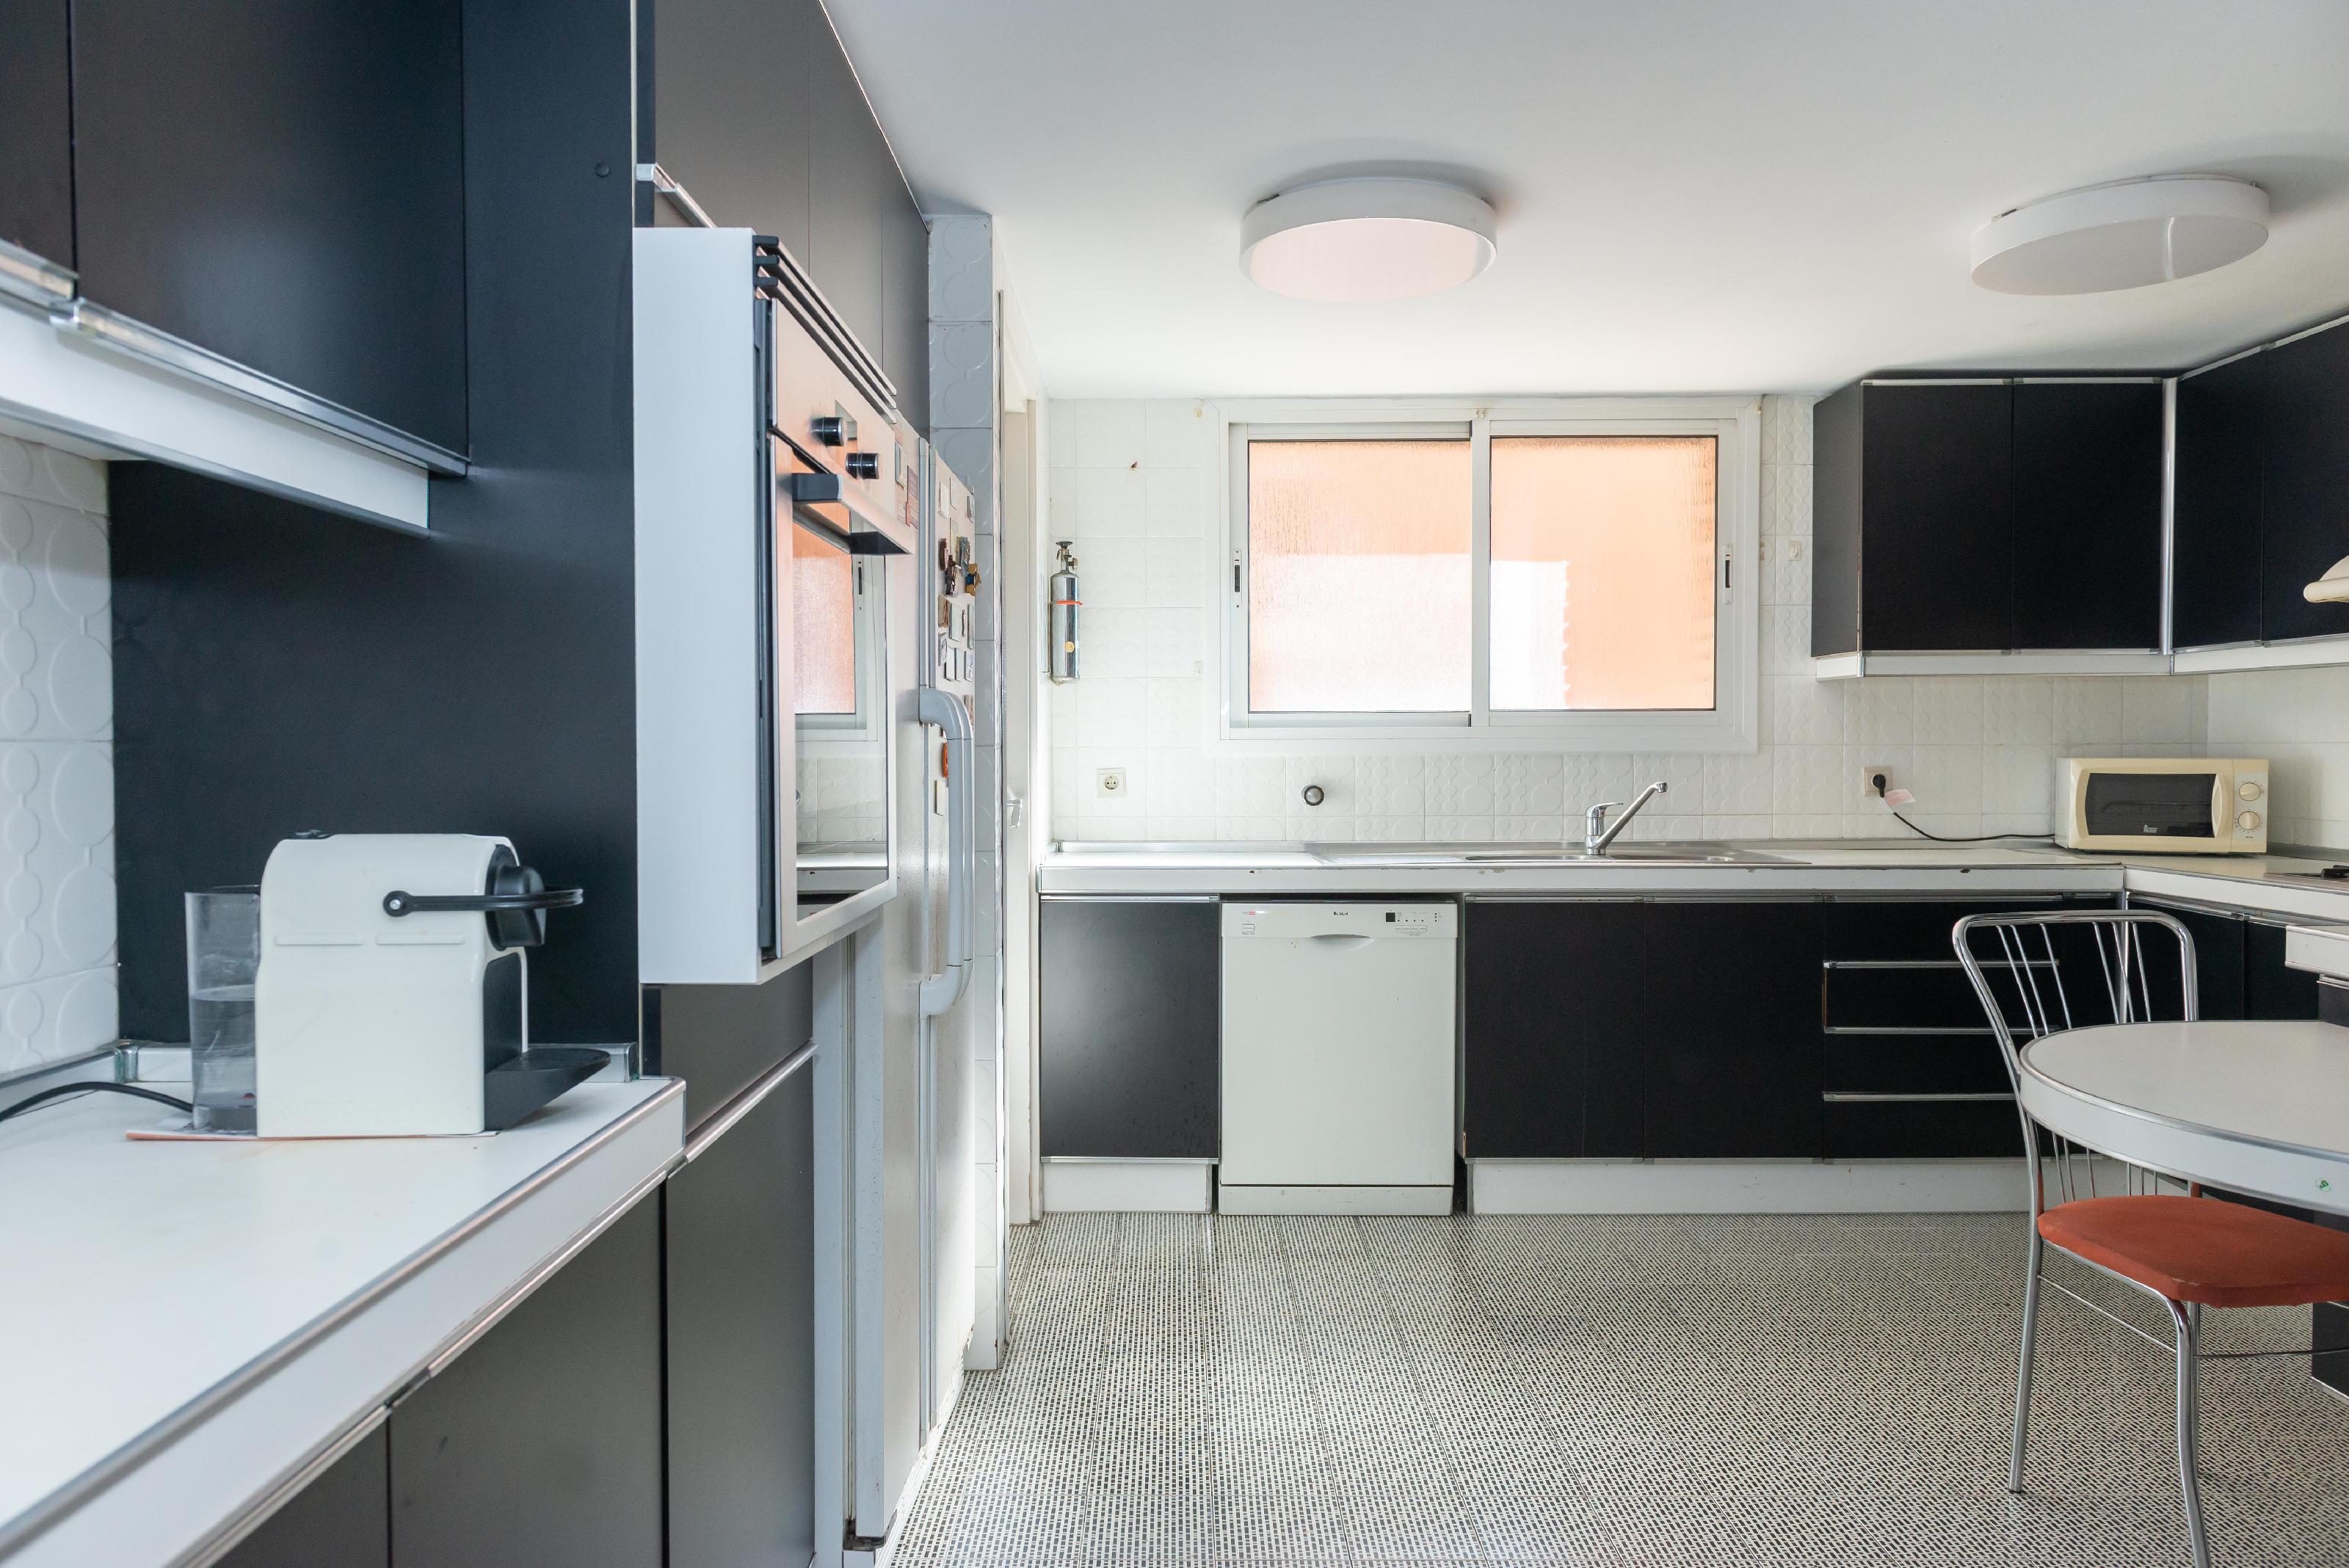 253899 Flat for sale in Sarrià-Sant Gervasi, Sant Gervasi-Galvany 16